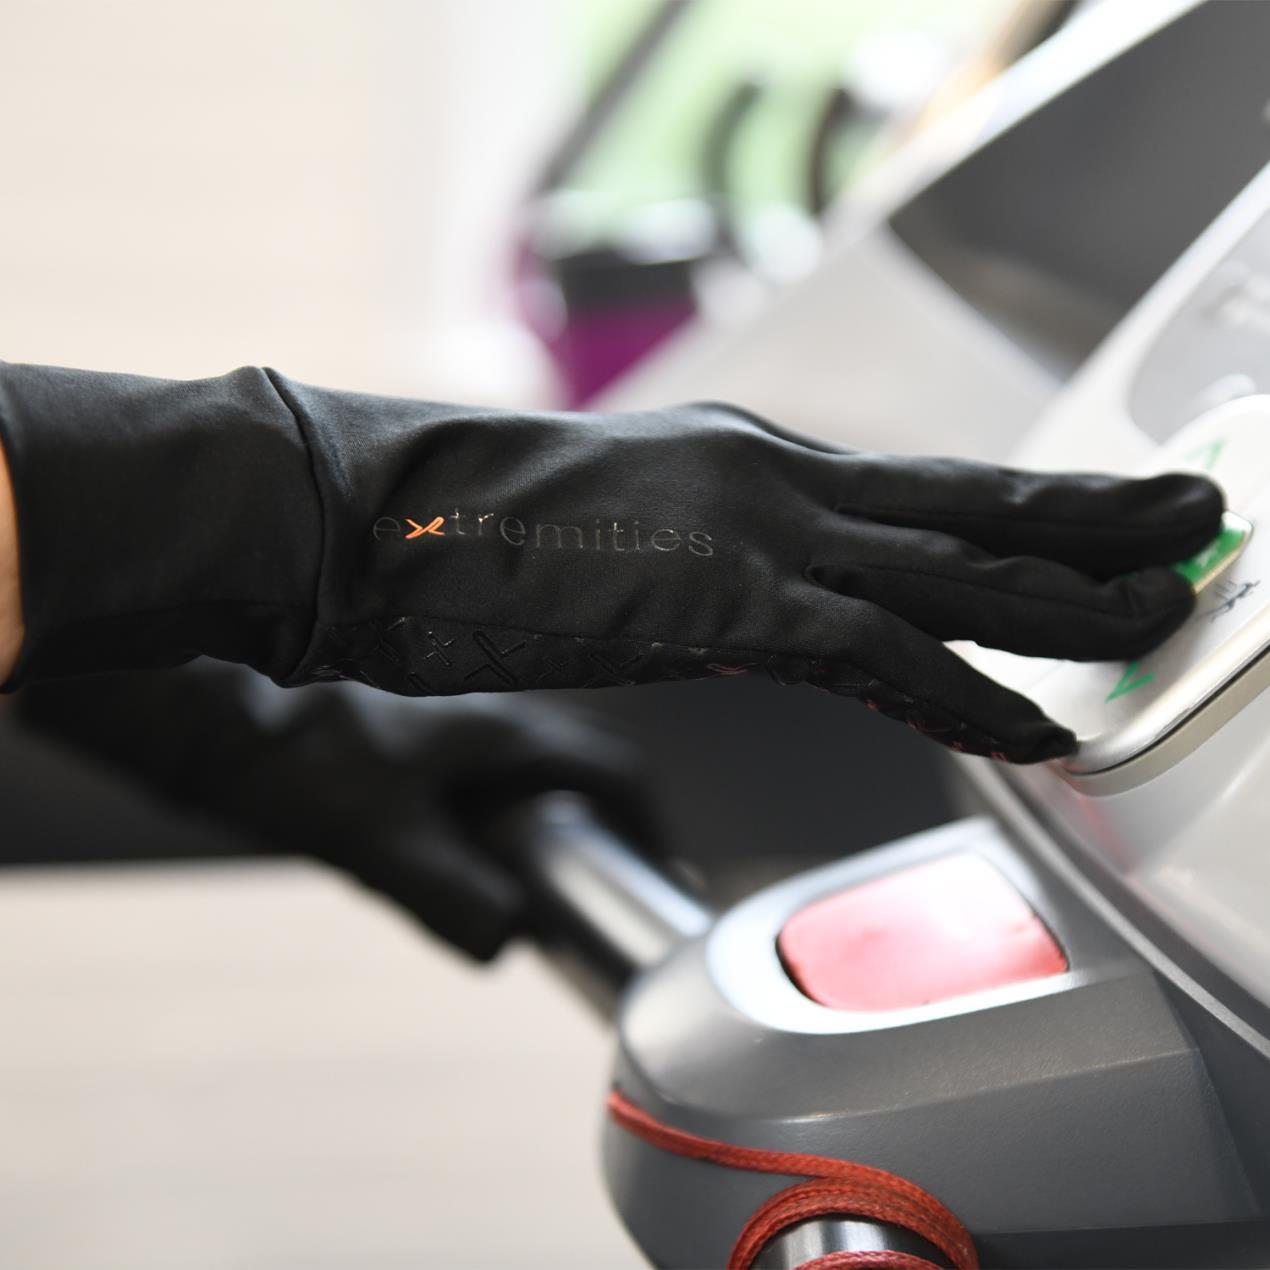 21DFG Deflect Glove Touch 1500x1500px (72dpi)